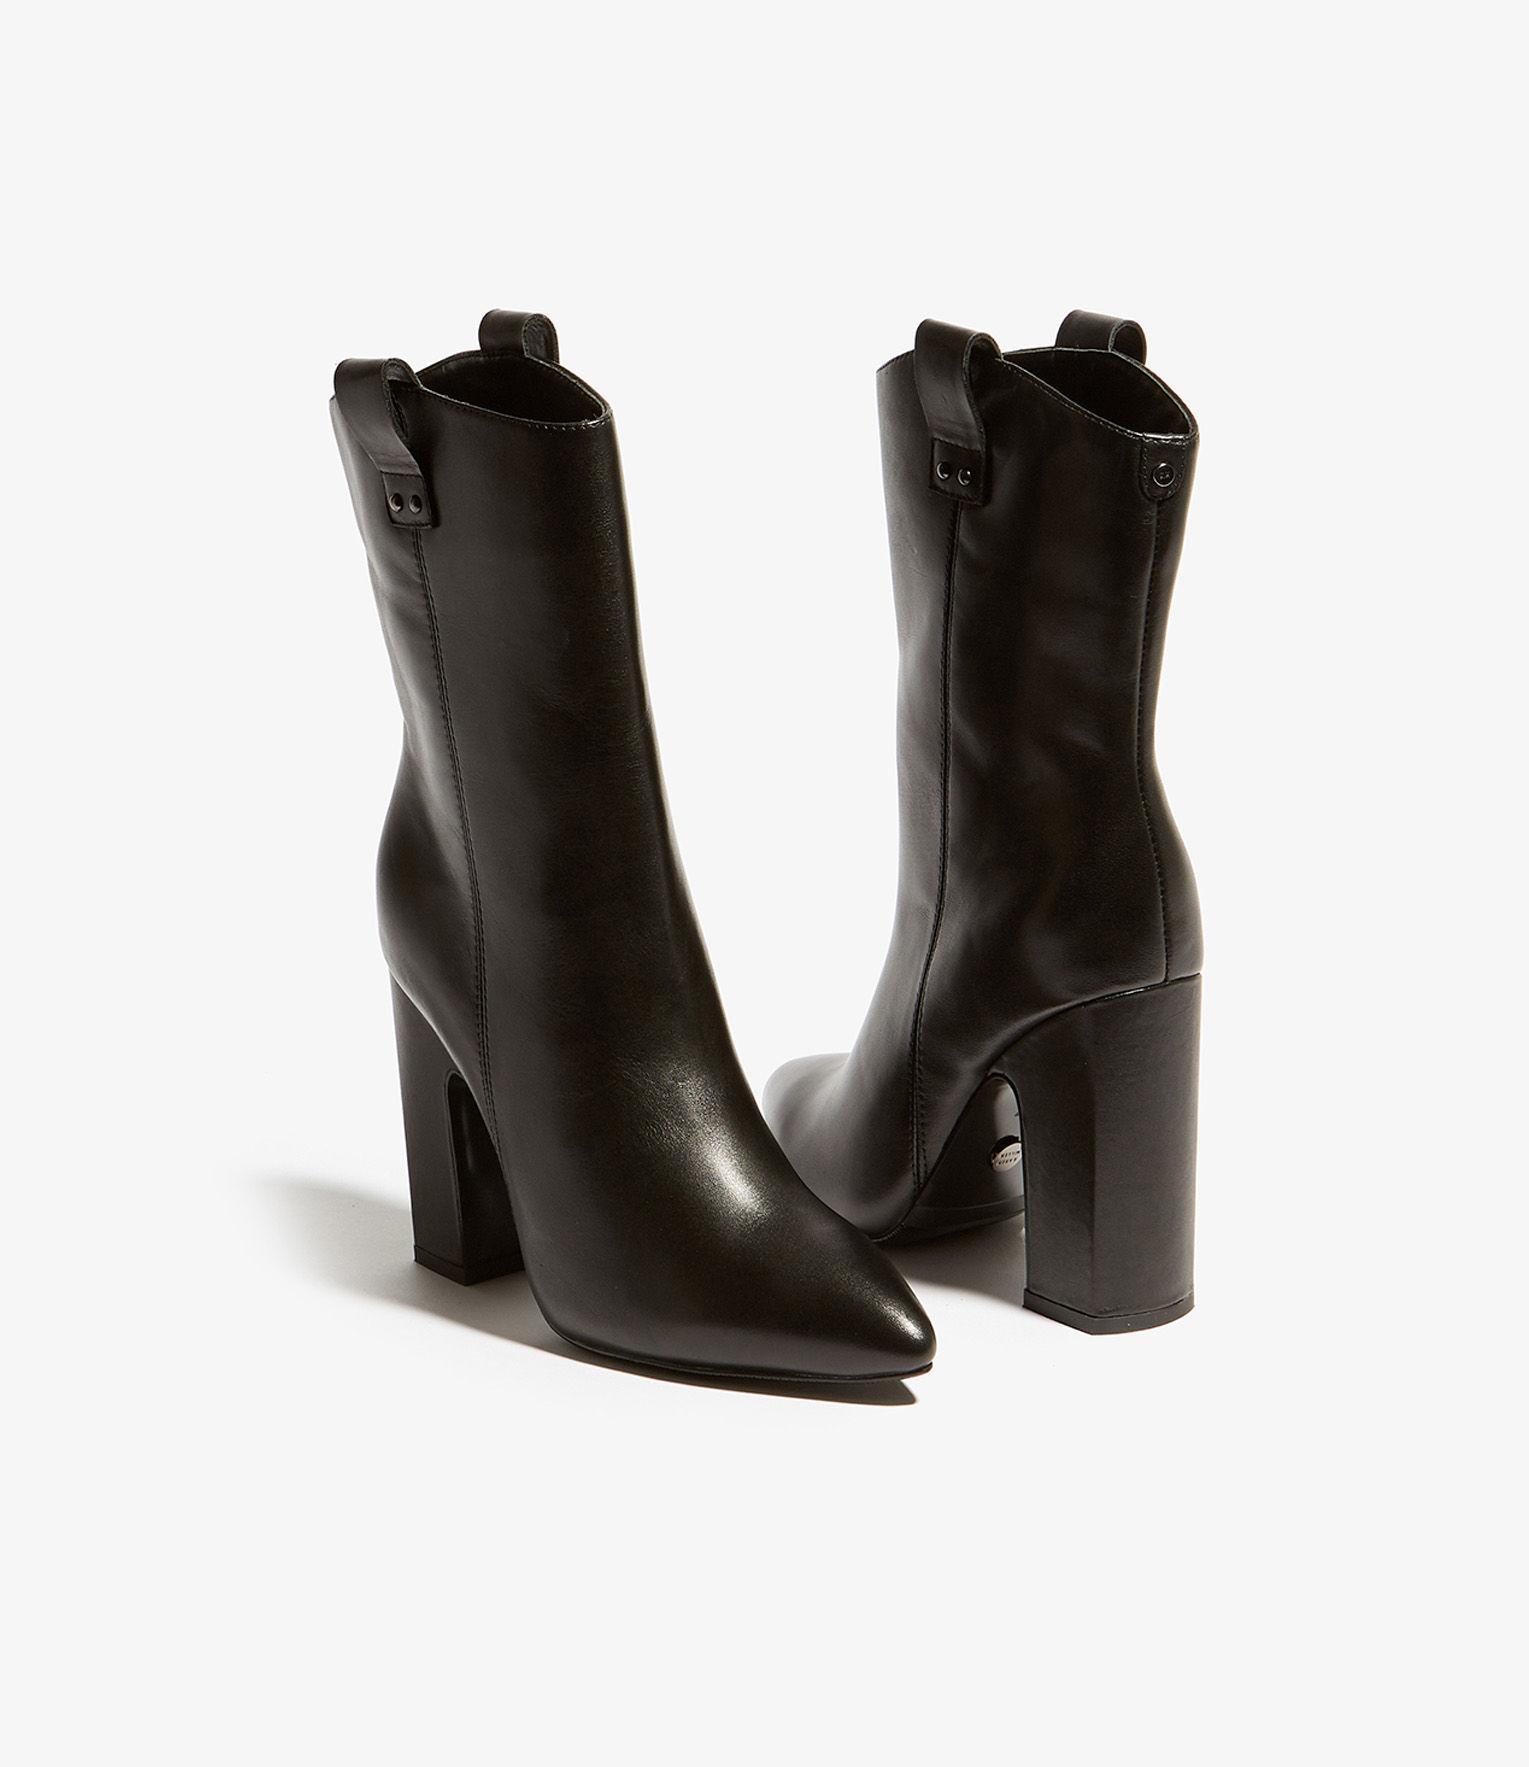 18fa6ddd9a47 Karen Millen - Black Pull-on Calf Boots - Lyst. View fullscreen